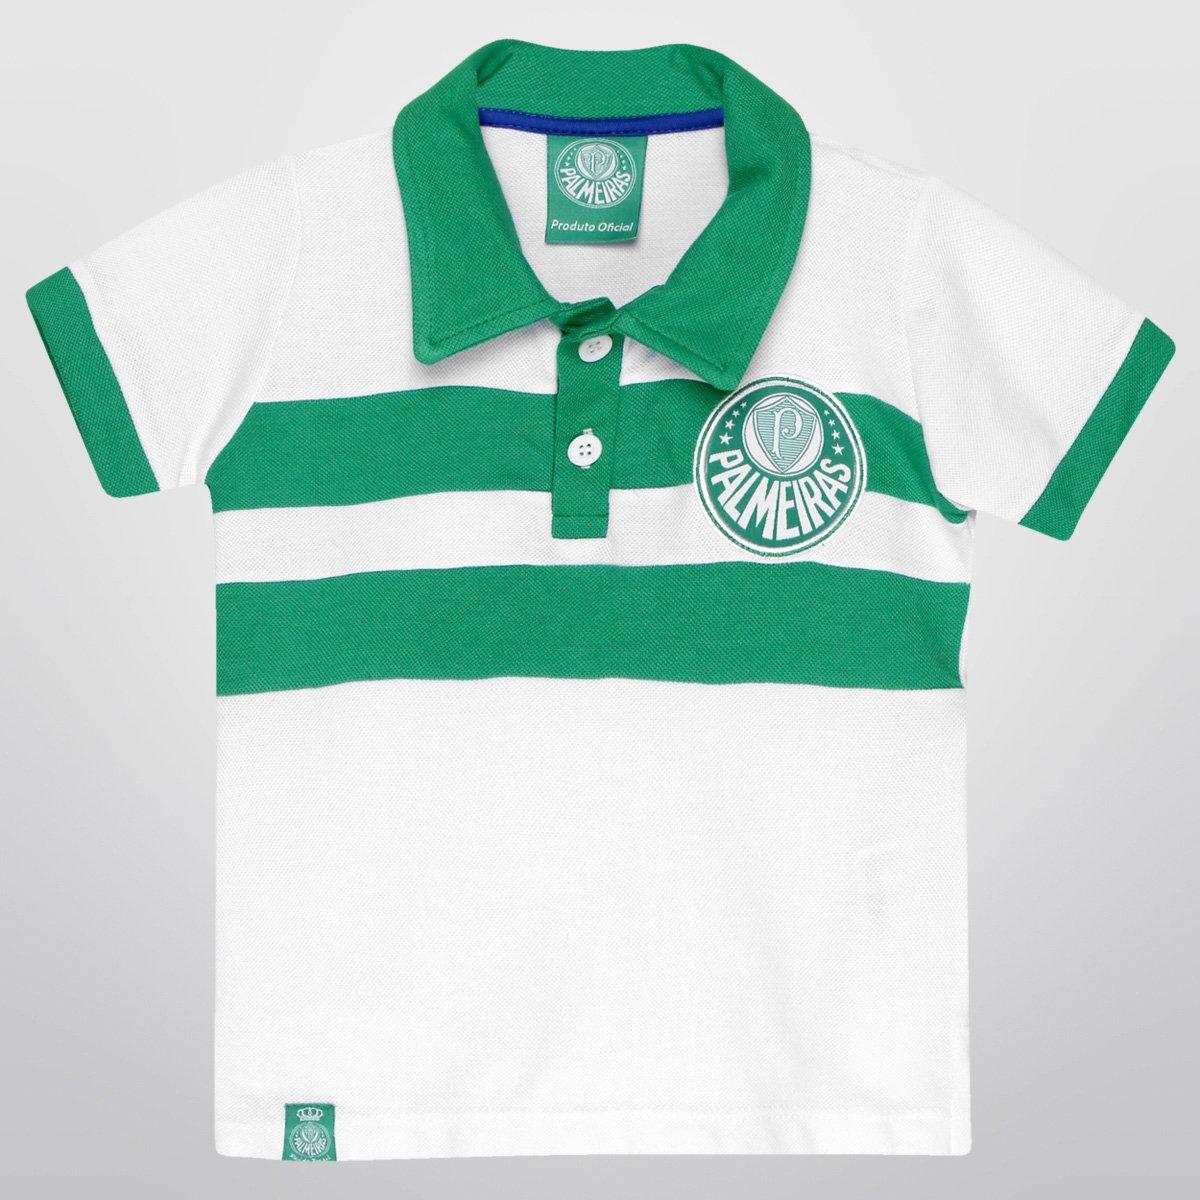 98d9469e68 Camisa Polo Palmeiras Listras Infantil | Zattini